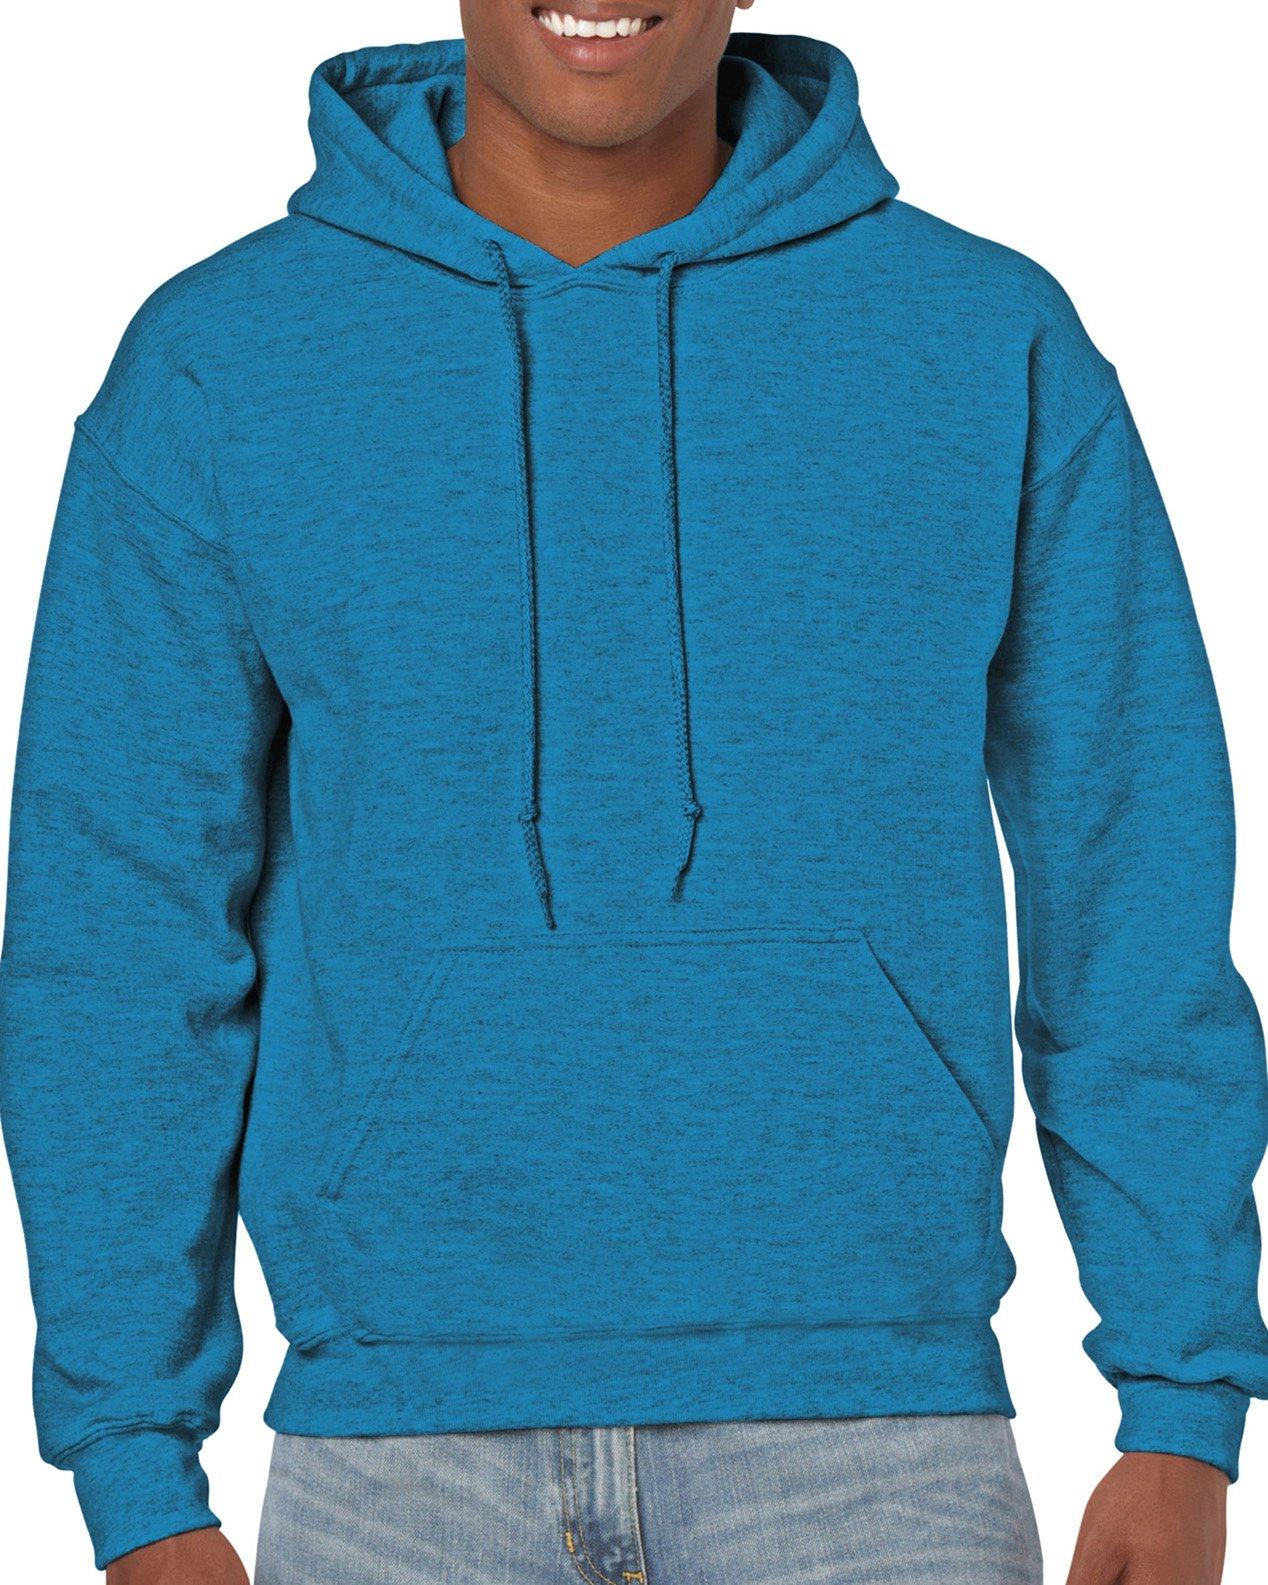 Gildan Men's Heavy Blend Fleece Hooded Sweatshirt G18500, Antique Sapphire, Small